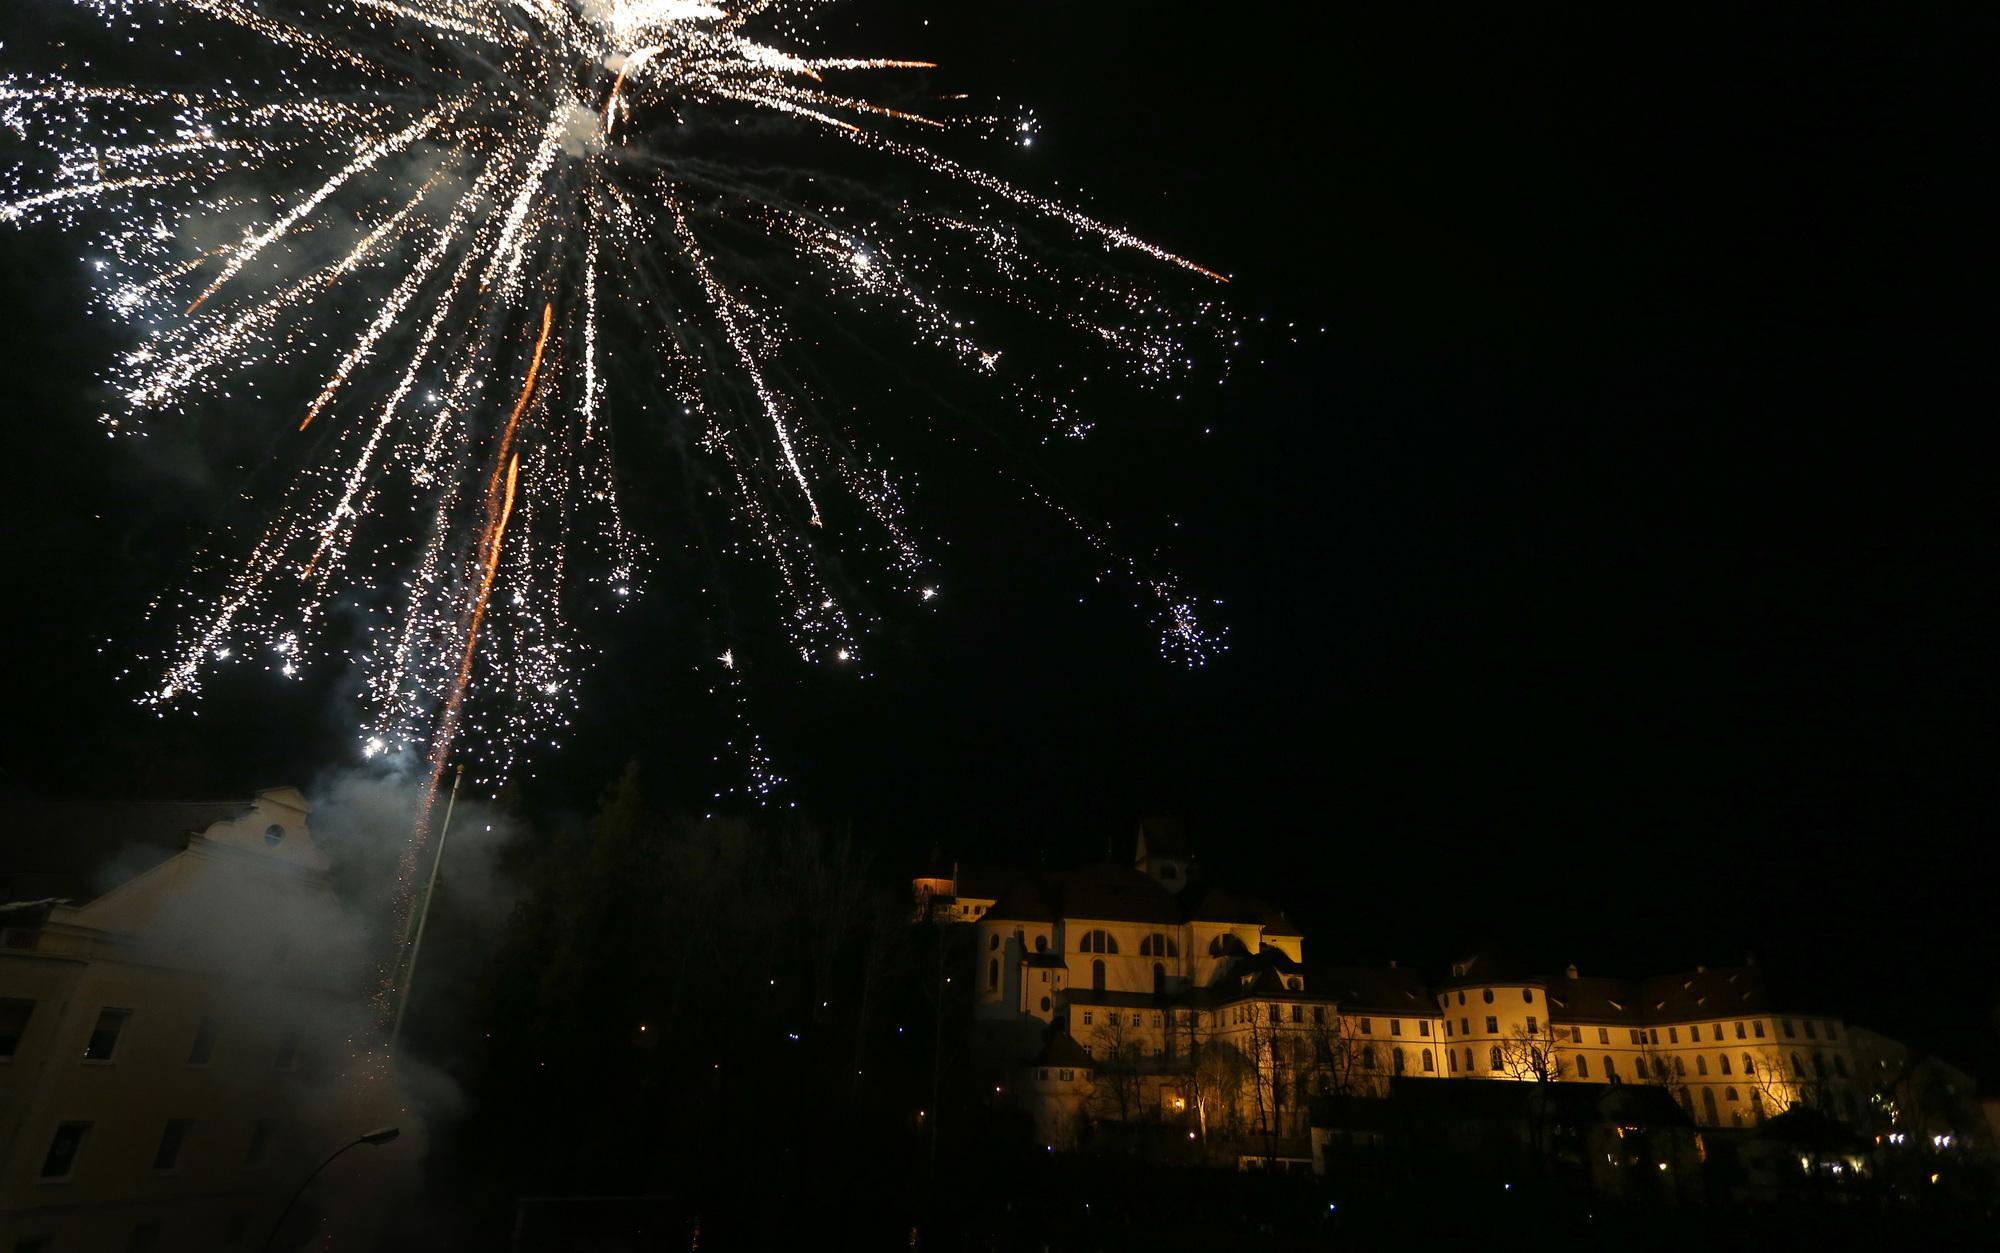 Corona: Diskussion über Feuerwerksverbot an Silvester 2020 ...